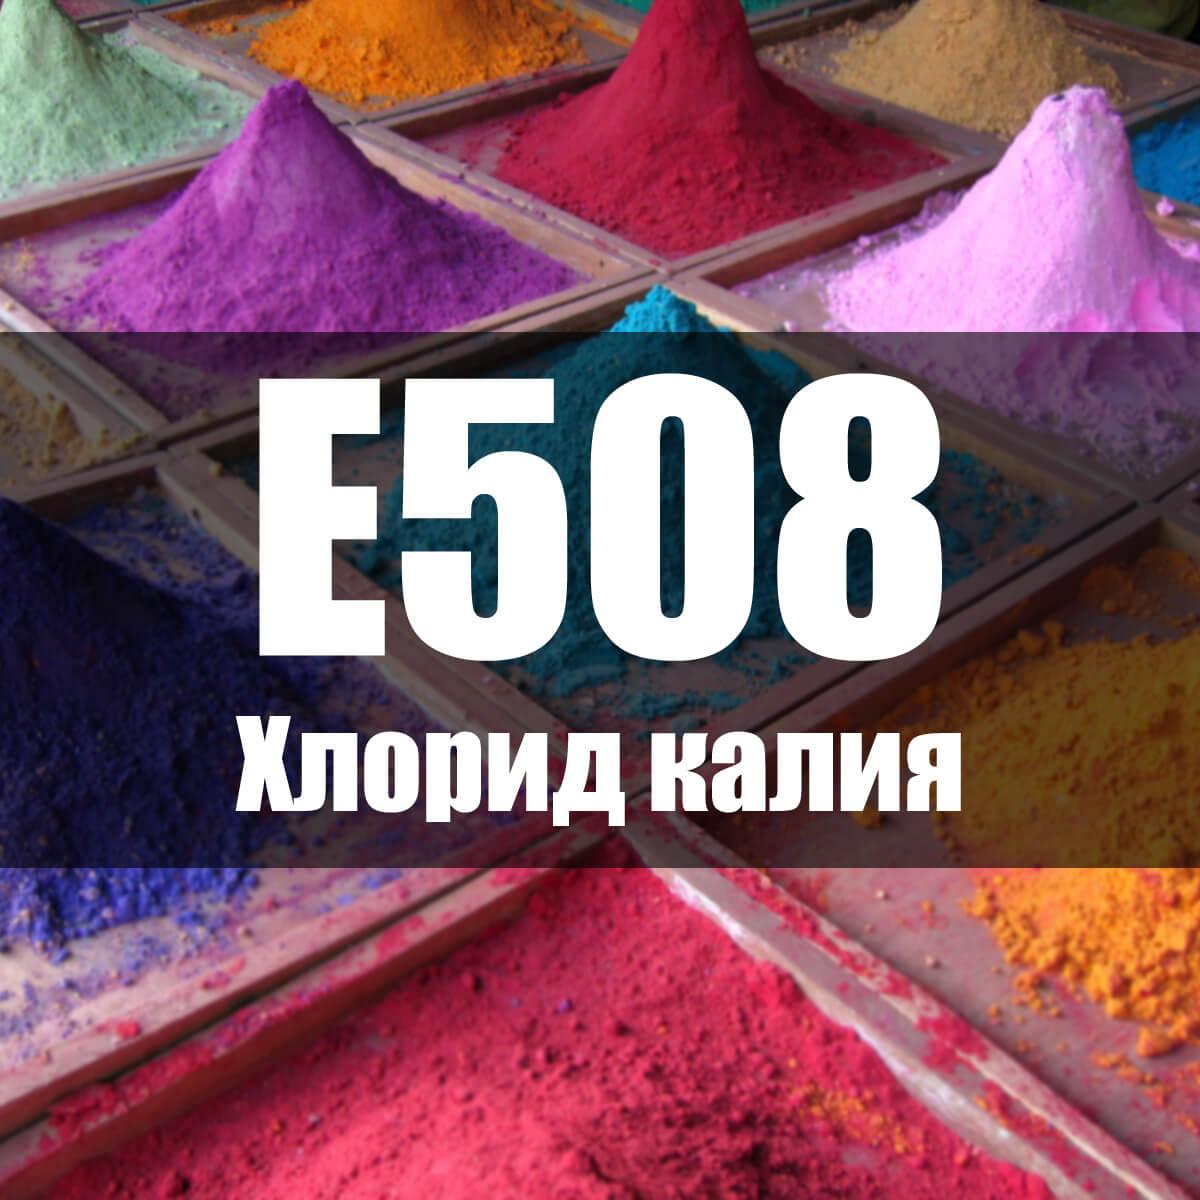 Хлорид калия (Е508): применение, свойства